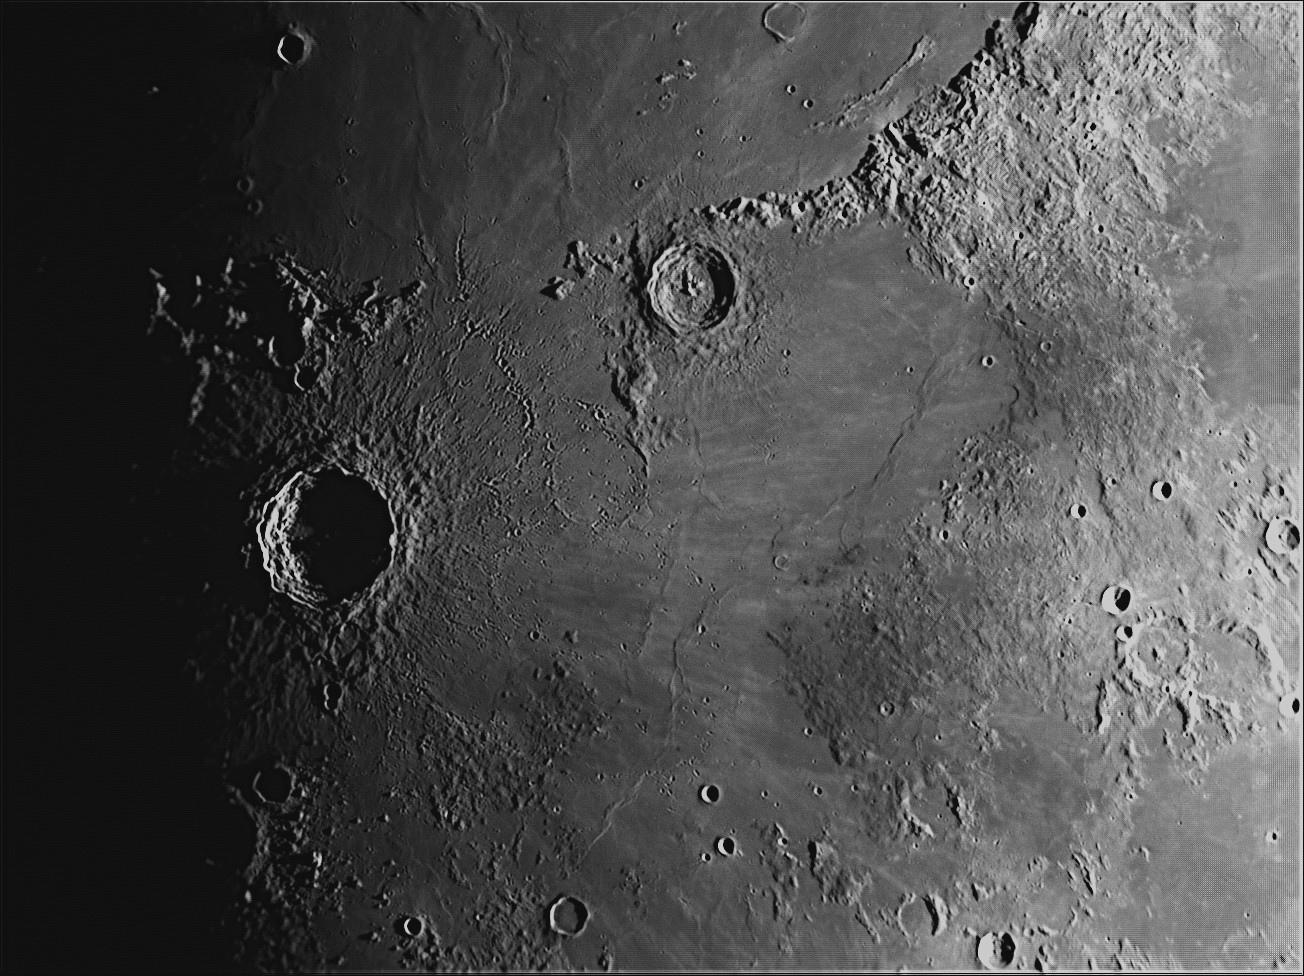 Moon_211047__100r_T48_320_reg.jpg.ad7a1aaa83cd697e1a6069ebb73bbeaf.jpg